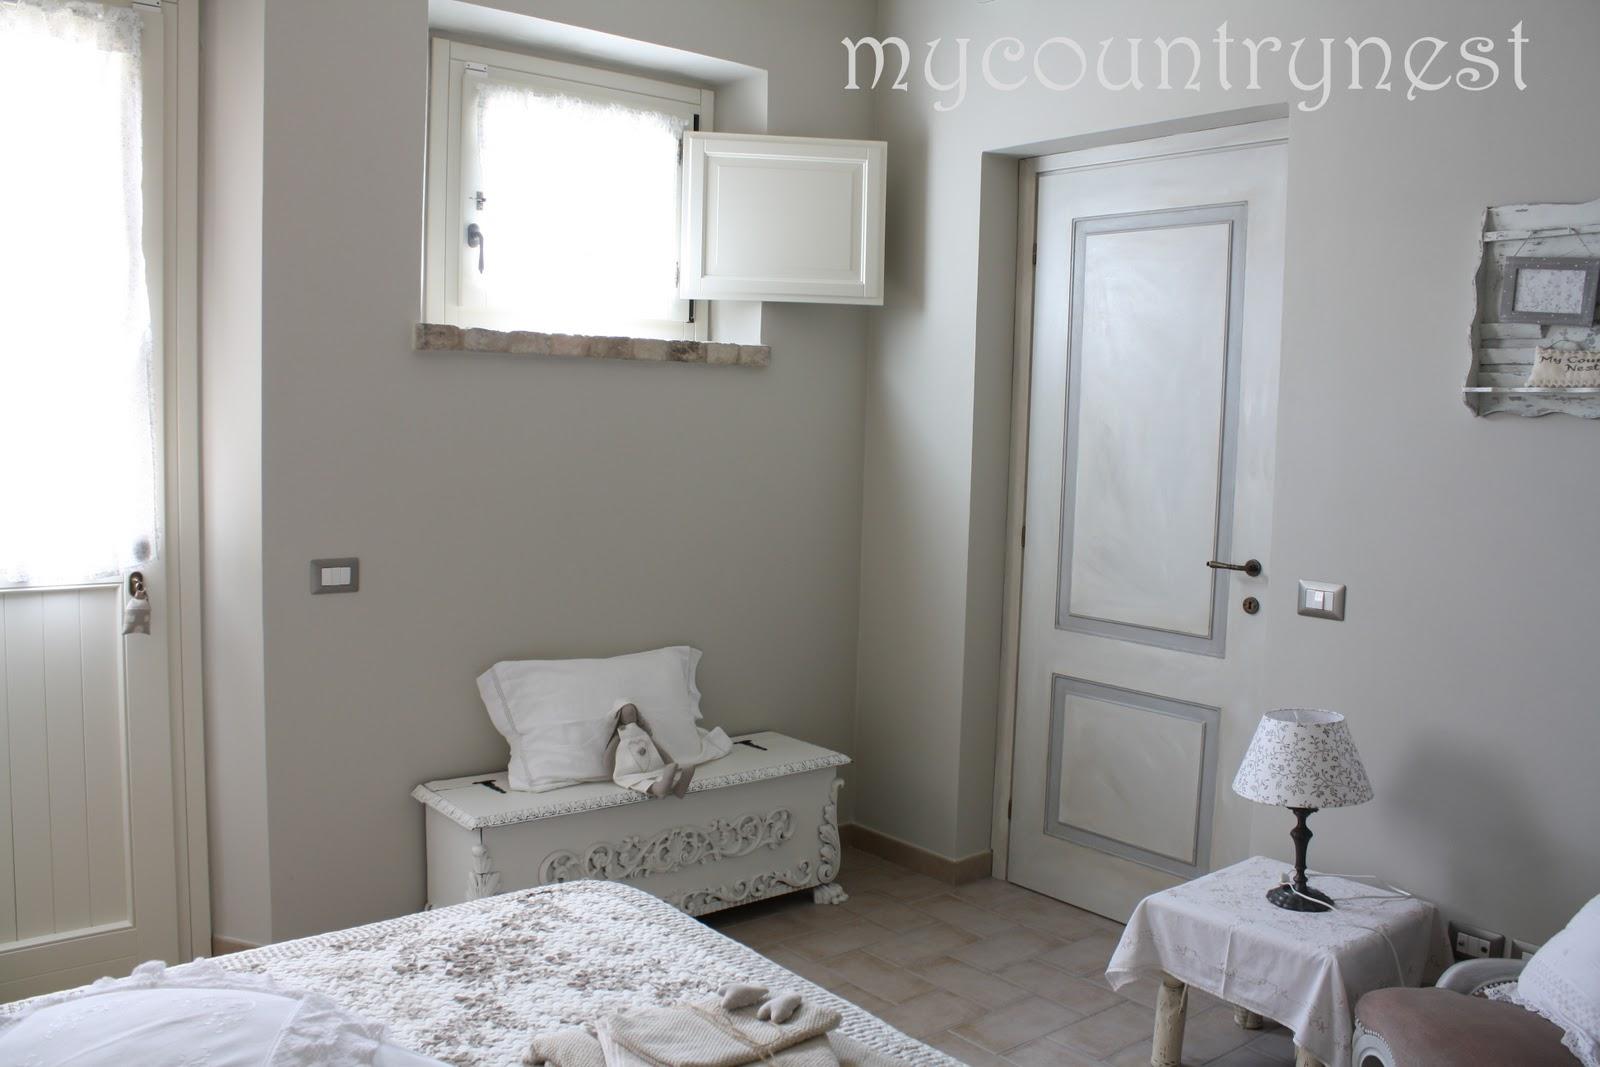 Corner Sofa Bed With Storage Friheten Manual White Wood Set Ikea Hoekslaapbank – Nazarm.com